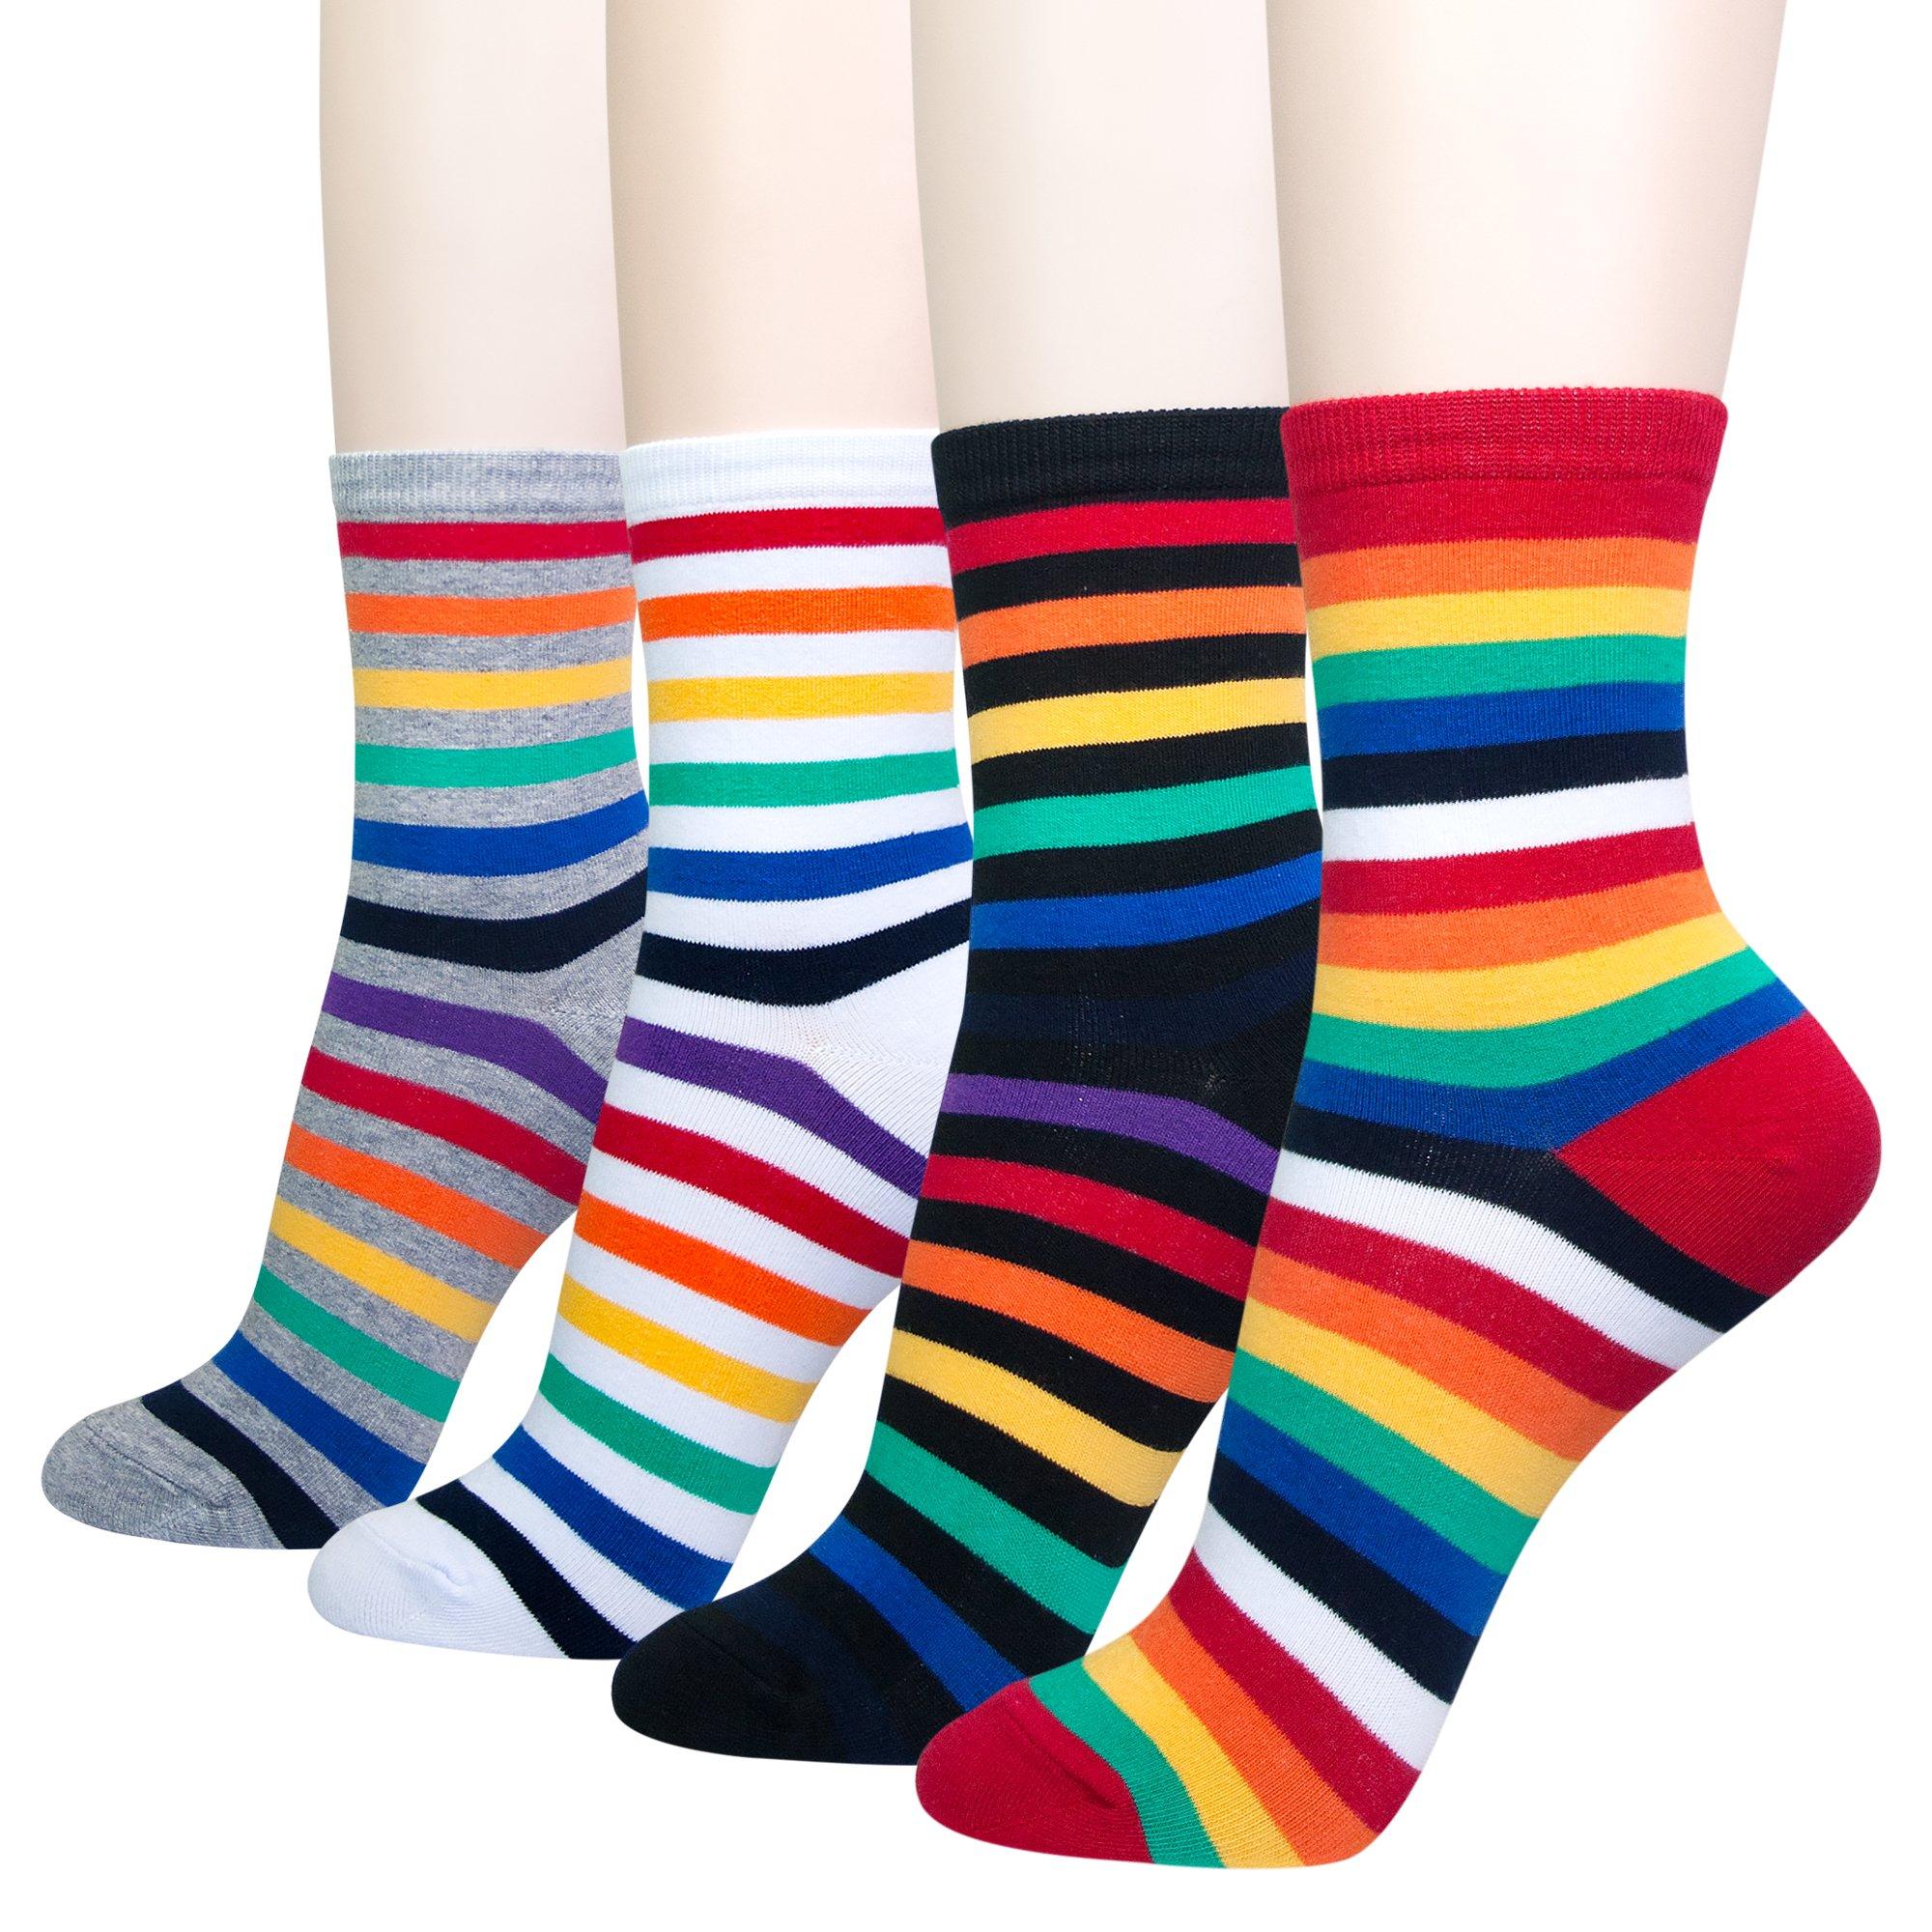 KONY Women's 4 Pack Cotton Rainbow Stripe Novelty Crew Socks - Women's Shoe Size 6-9 (Classic Rainbow - 4 Pairs)